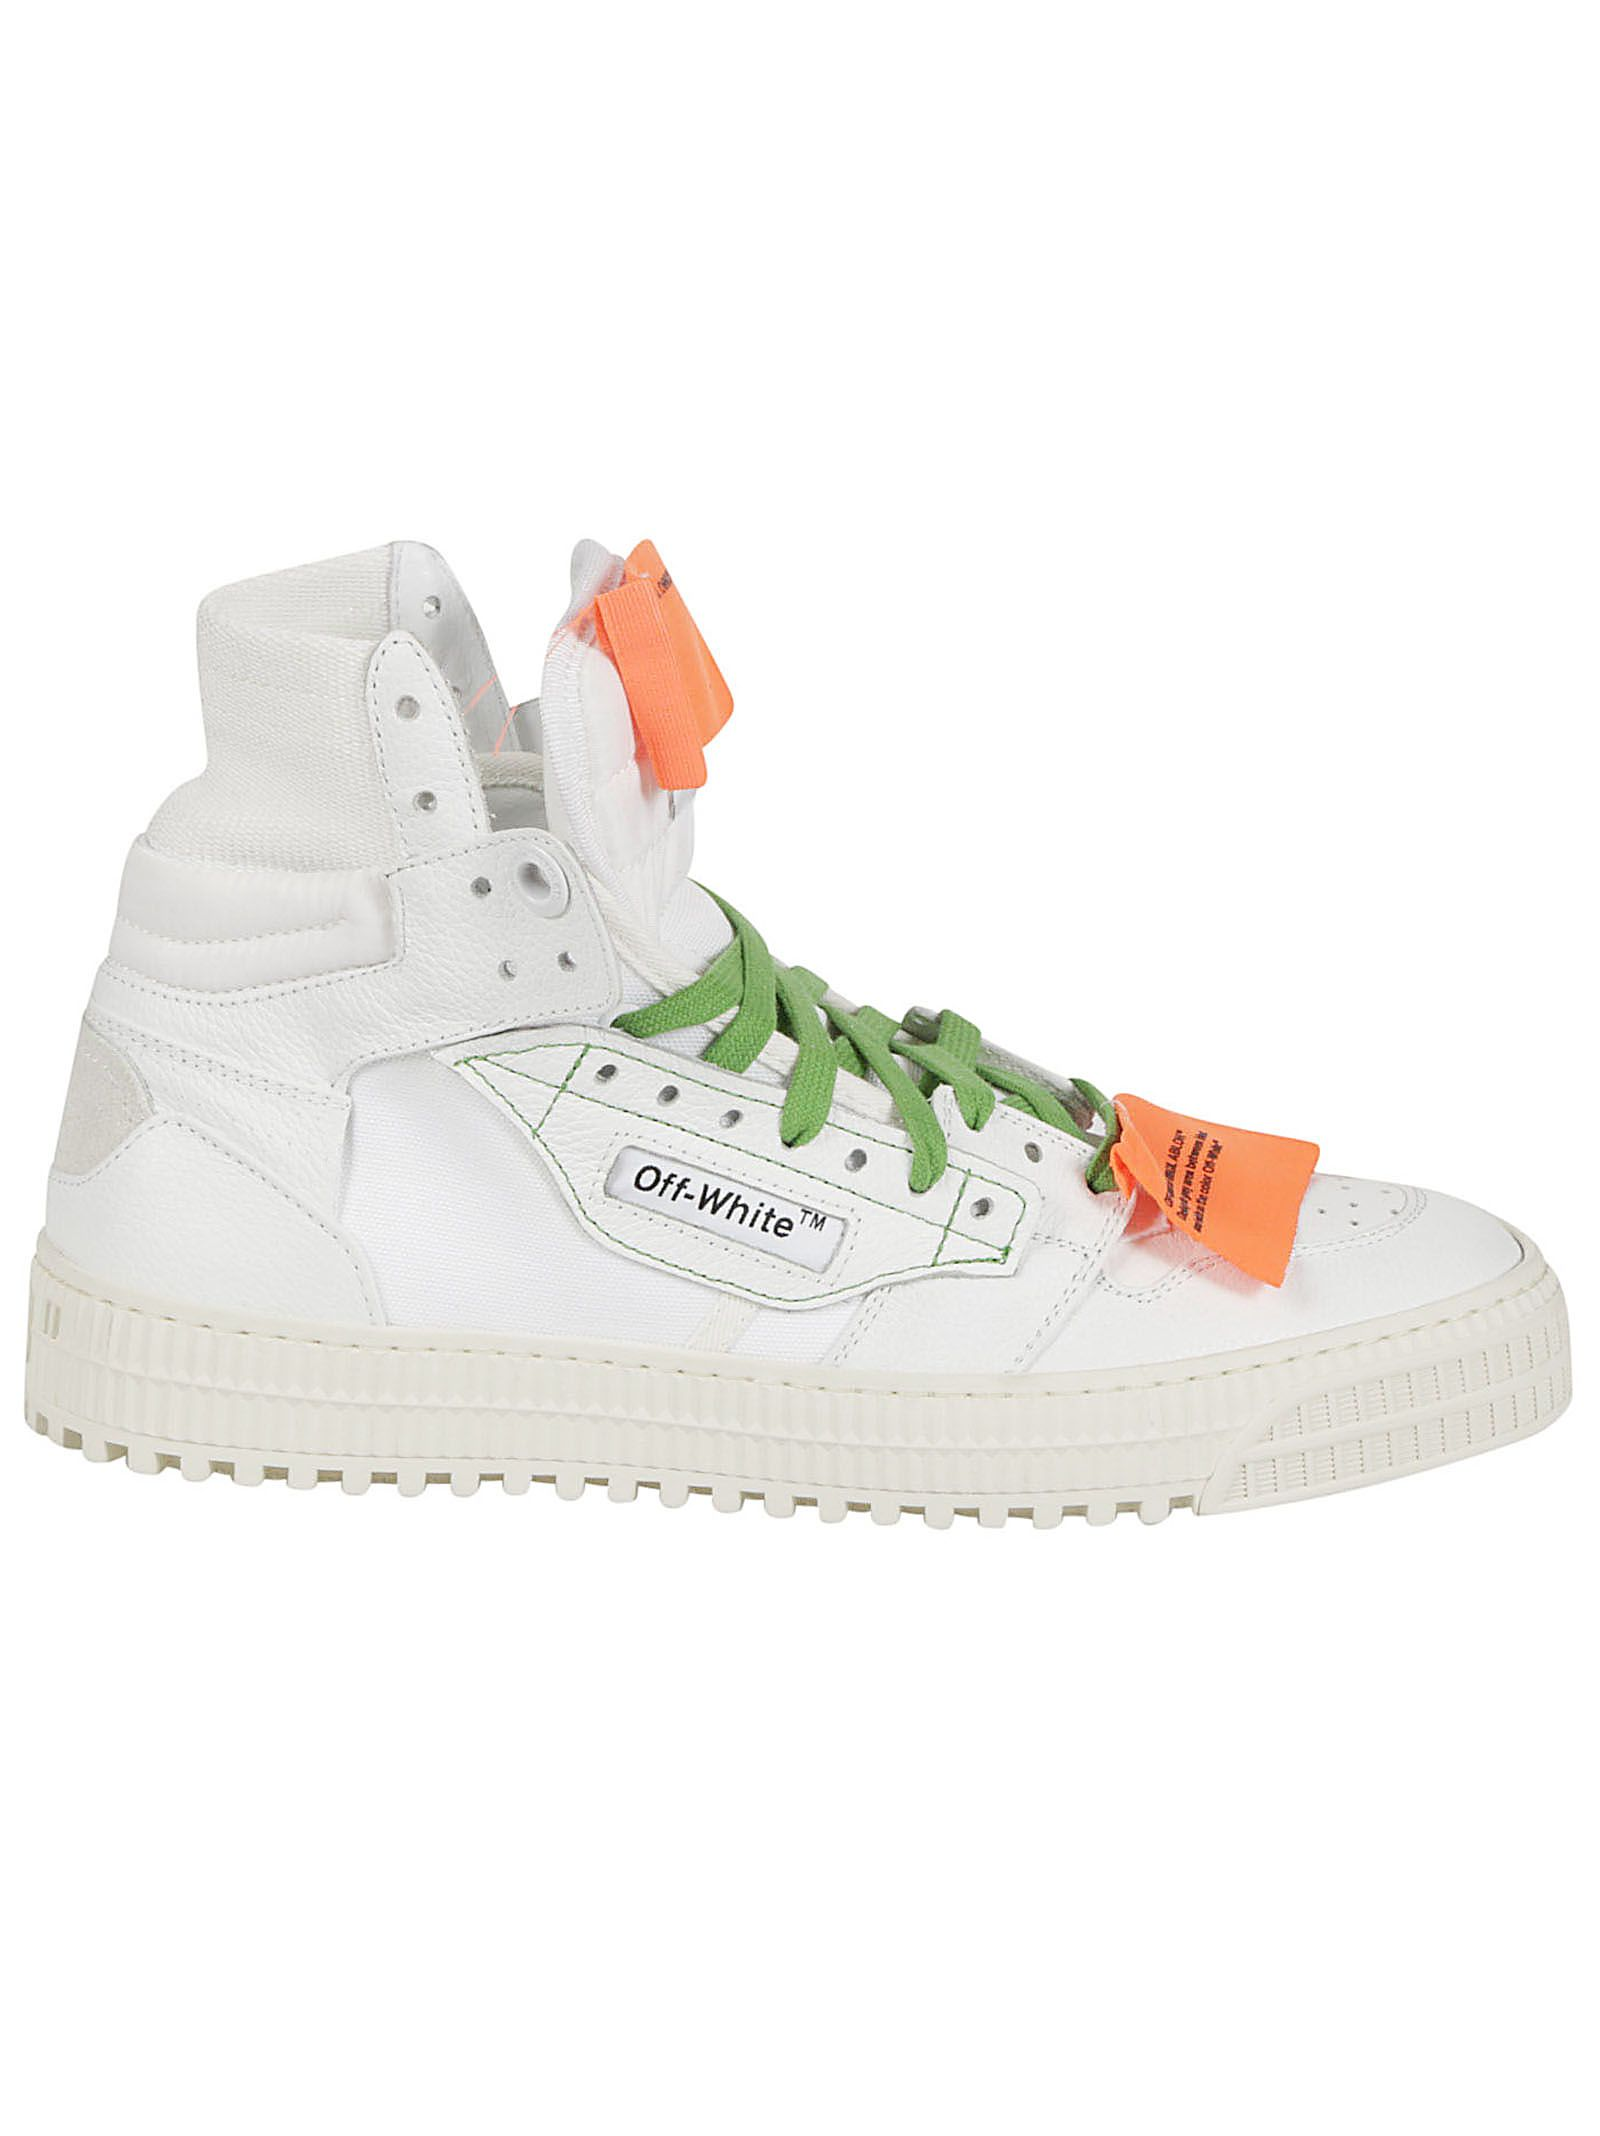 Off-white Low 3.0 Hi-top Sneakers